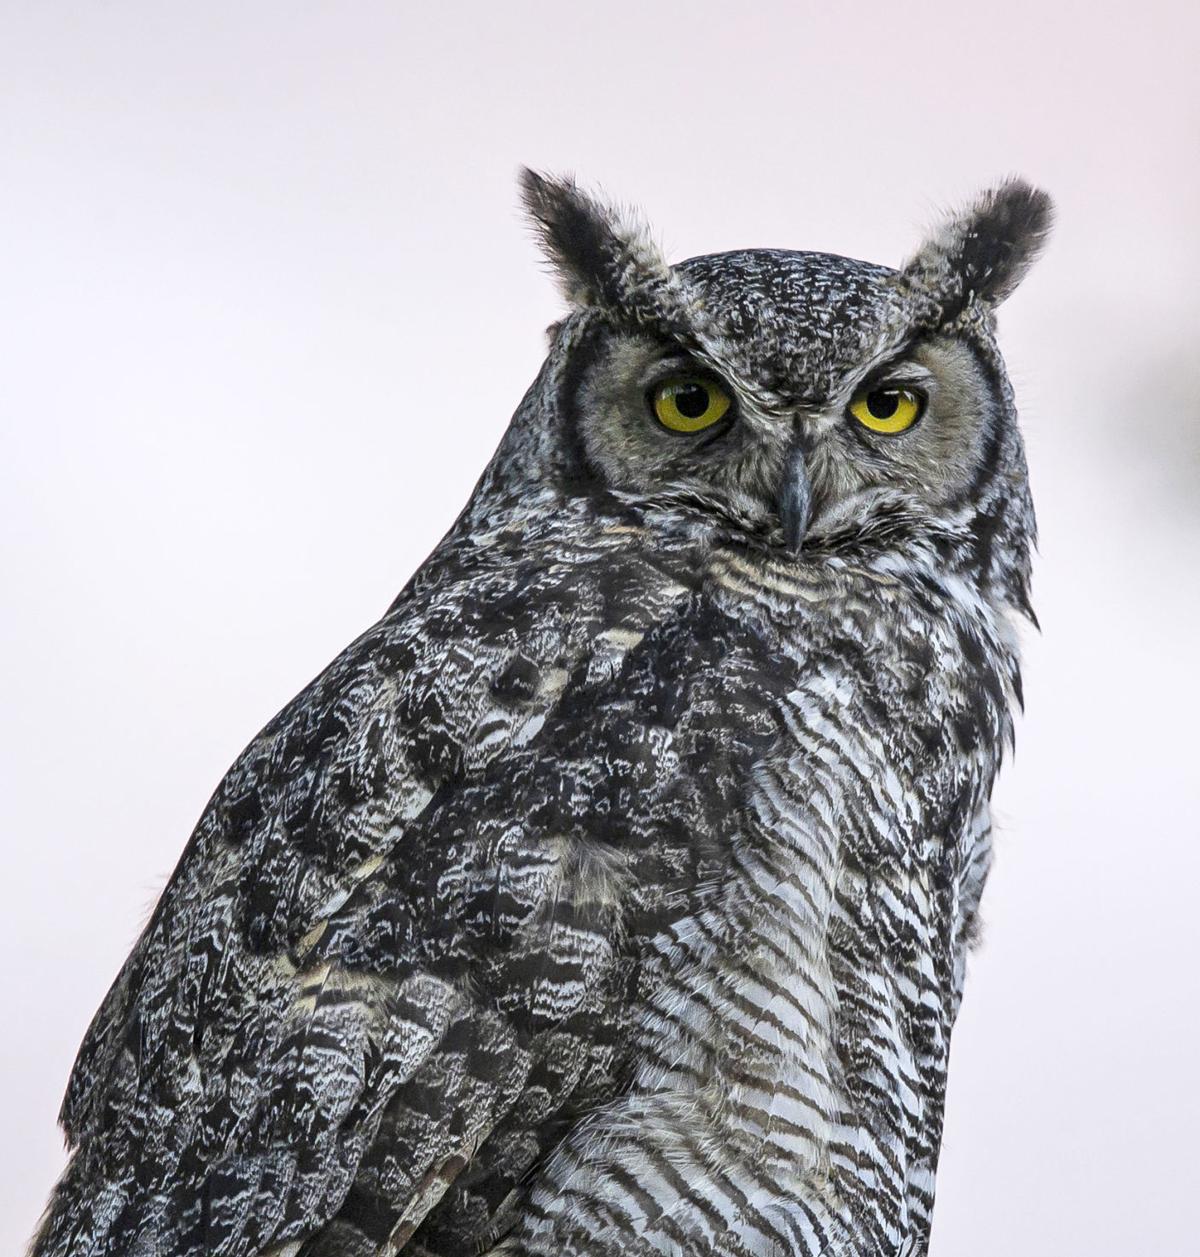 Great Horned Owls Yearlong Residents In Bitteroot Local News Ravallirepublic Com